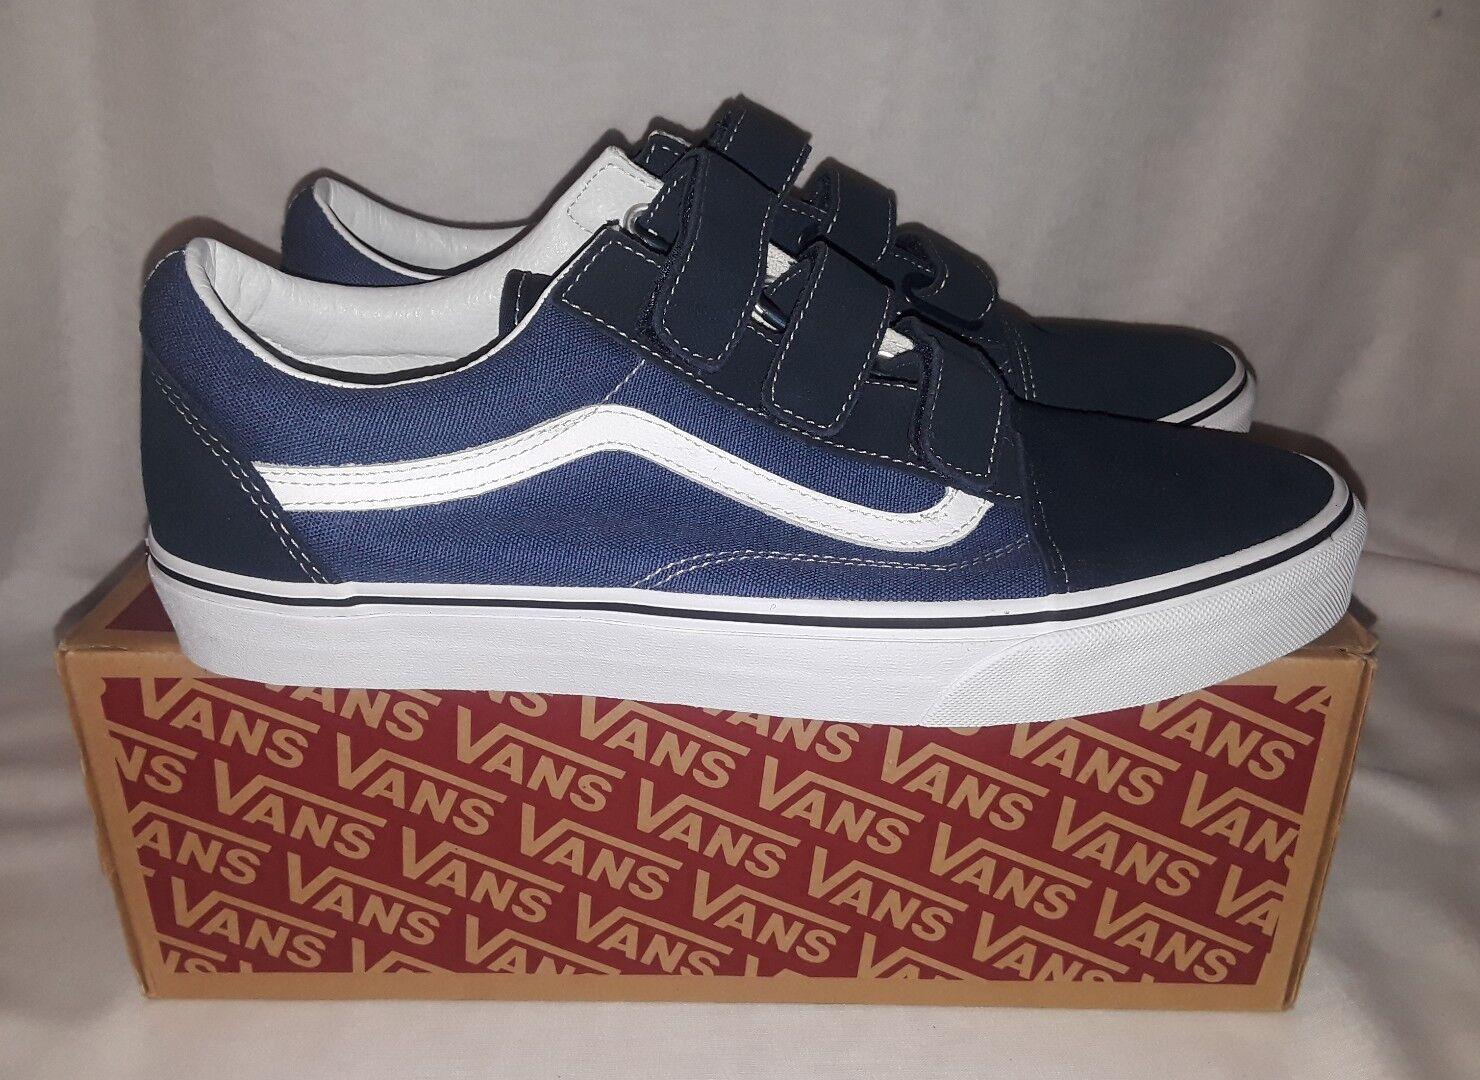 VANS Old Skool V Shoes Blue White 12